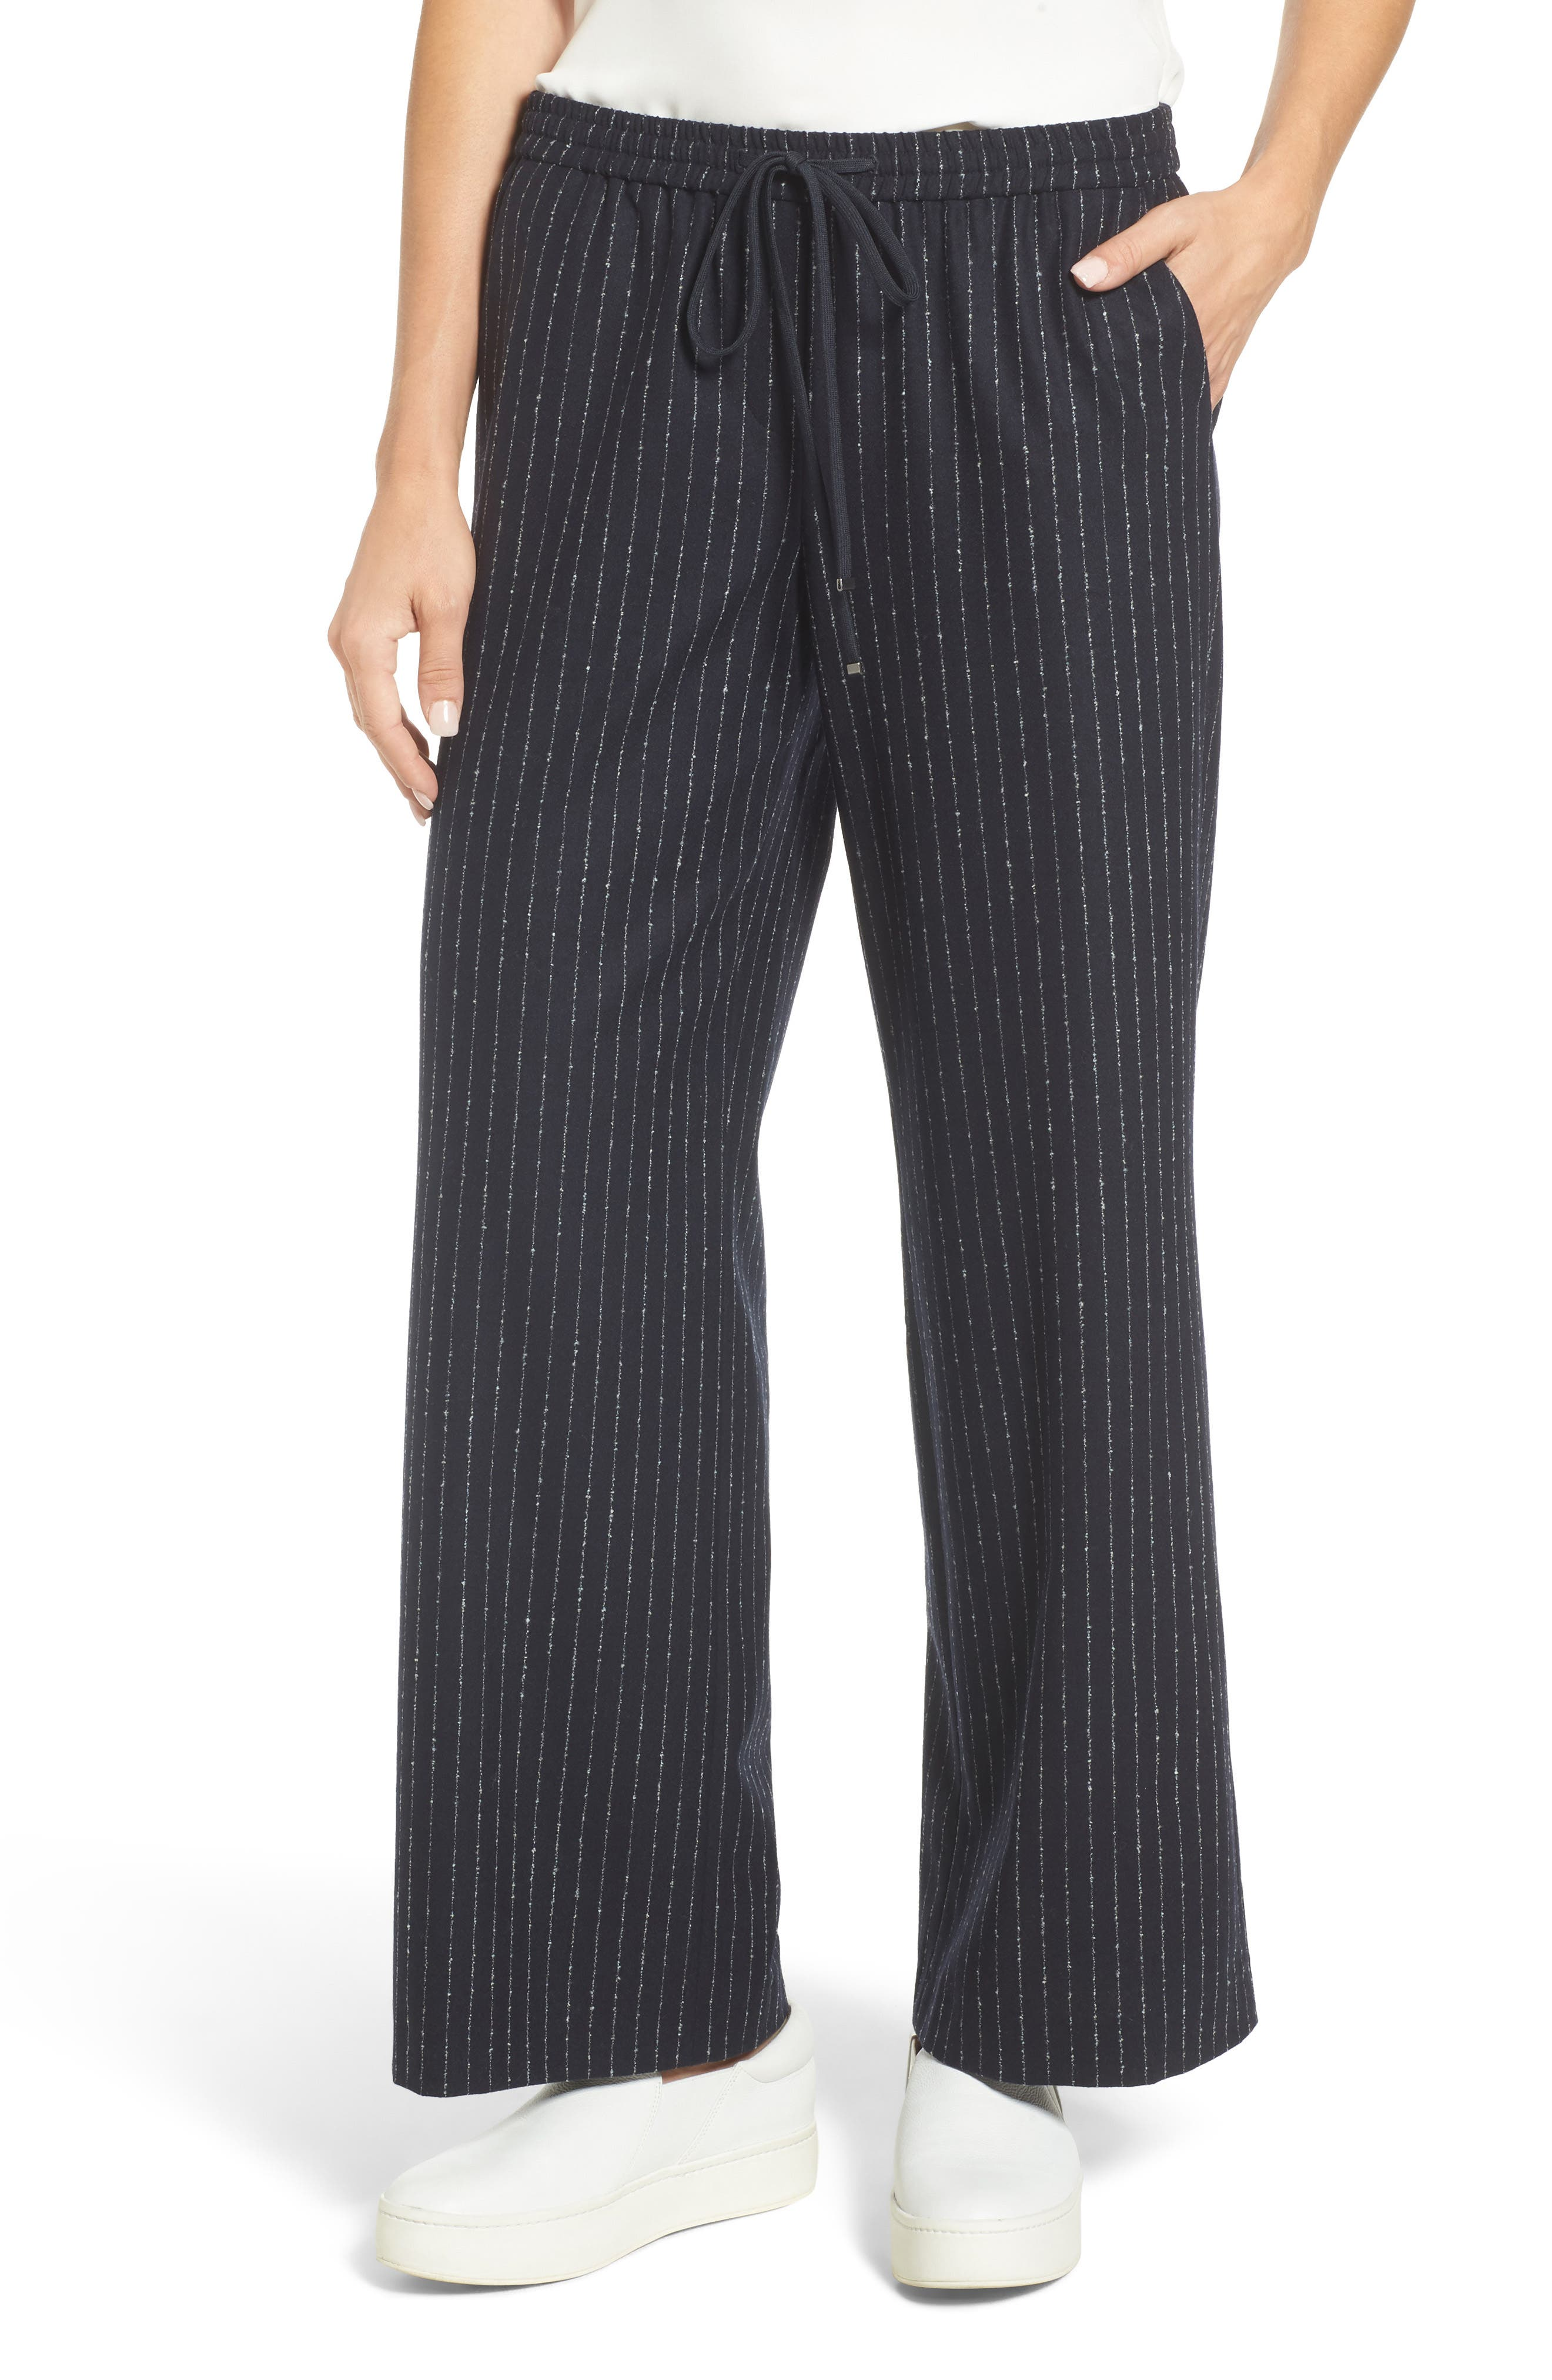 Alternate Image 1 Selected - Nordstrom Signature Wide-Leg Crop Pants